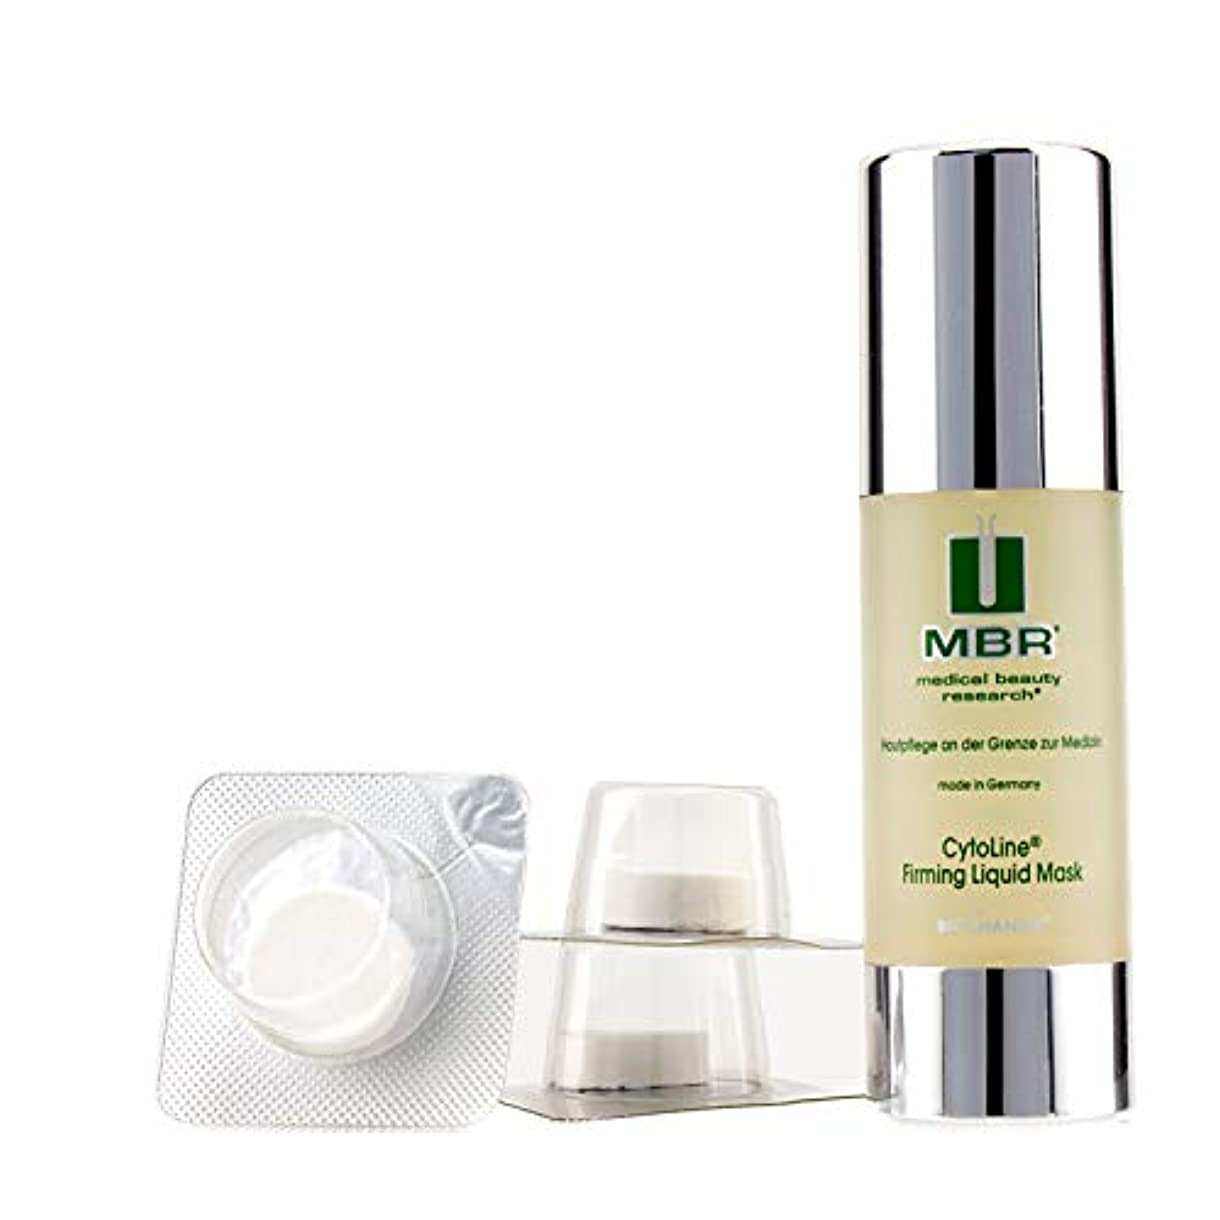 MBR Medical Beauty Research BioChange CytoLine Firming Liquid Mask 6applications並行輸入品